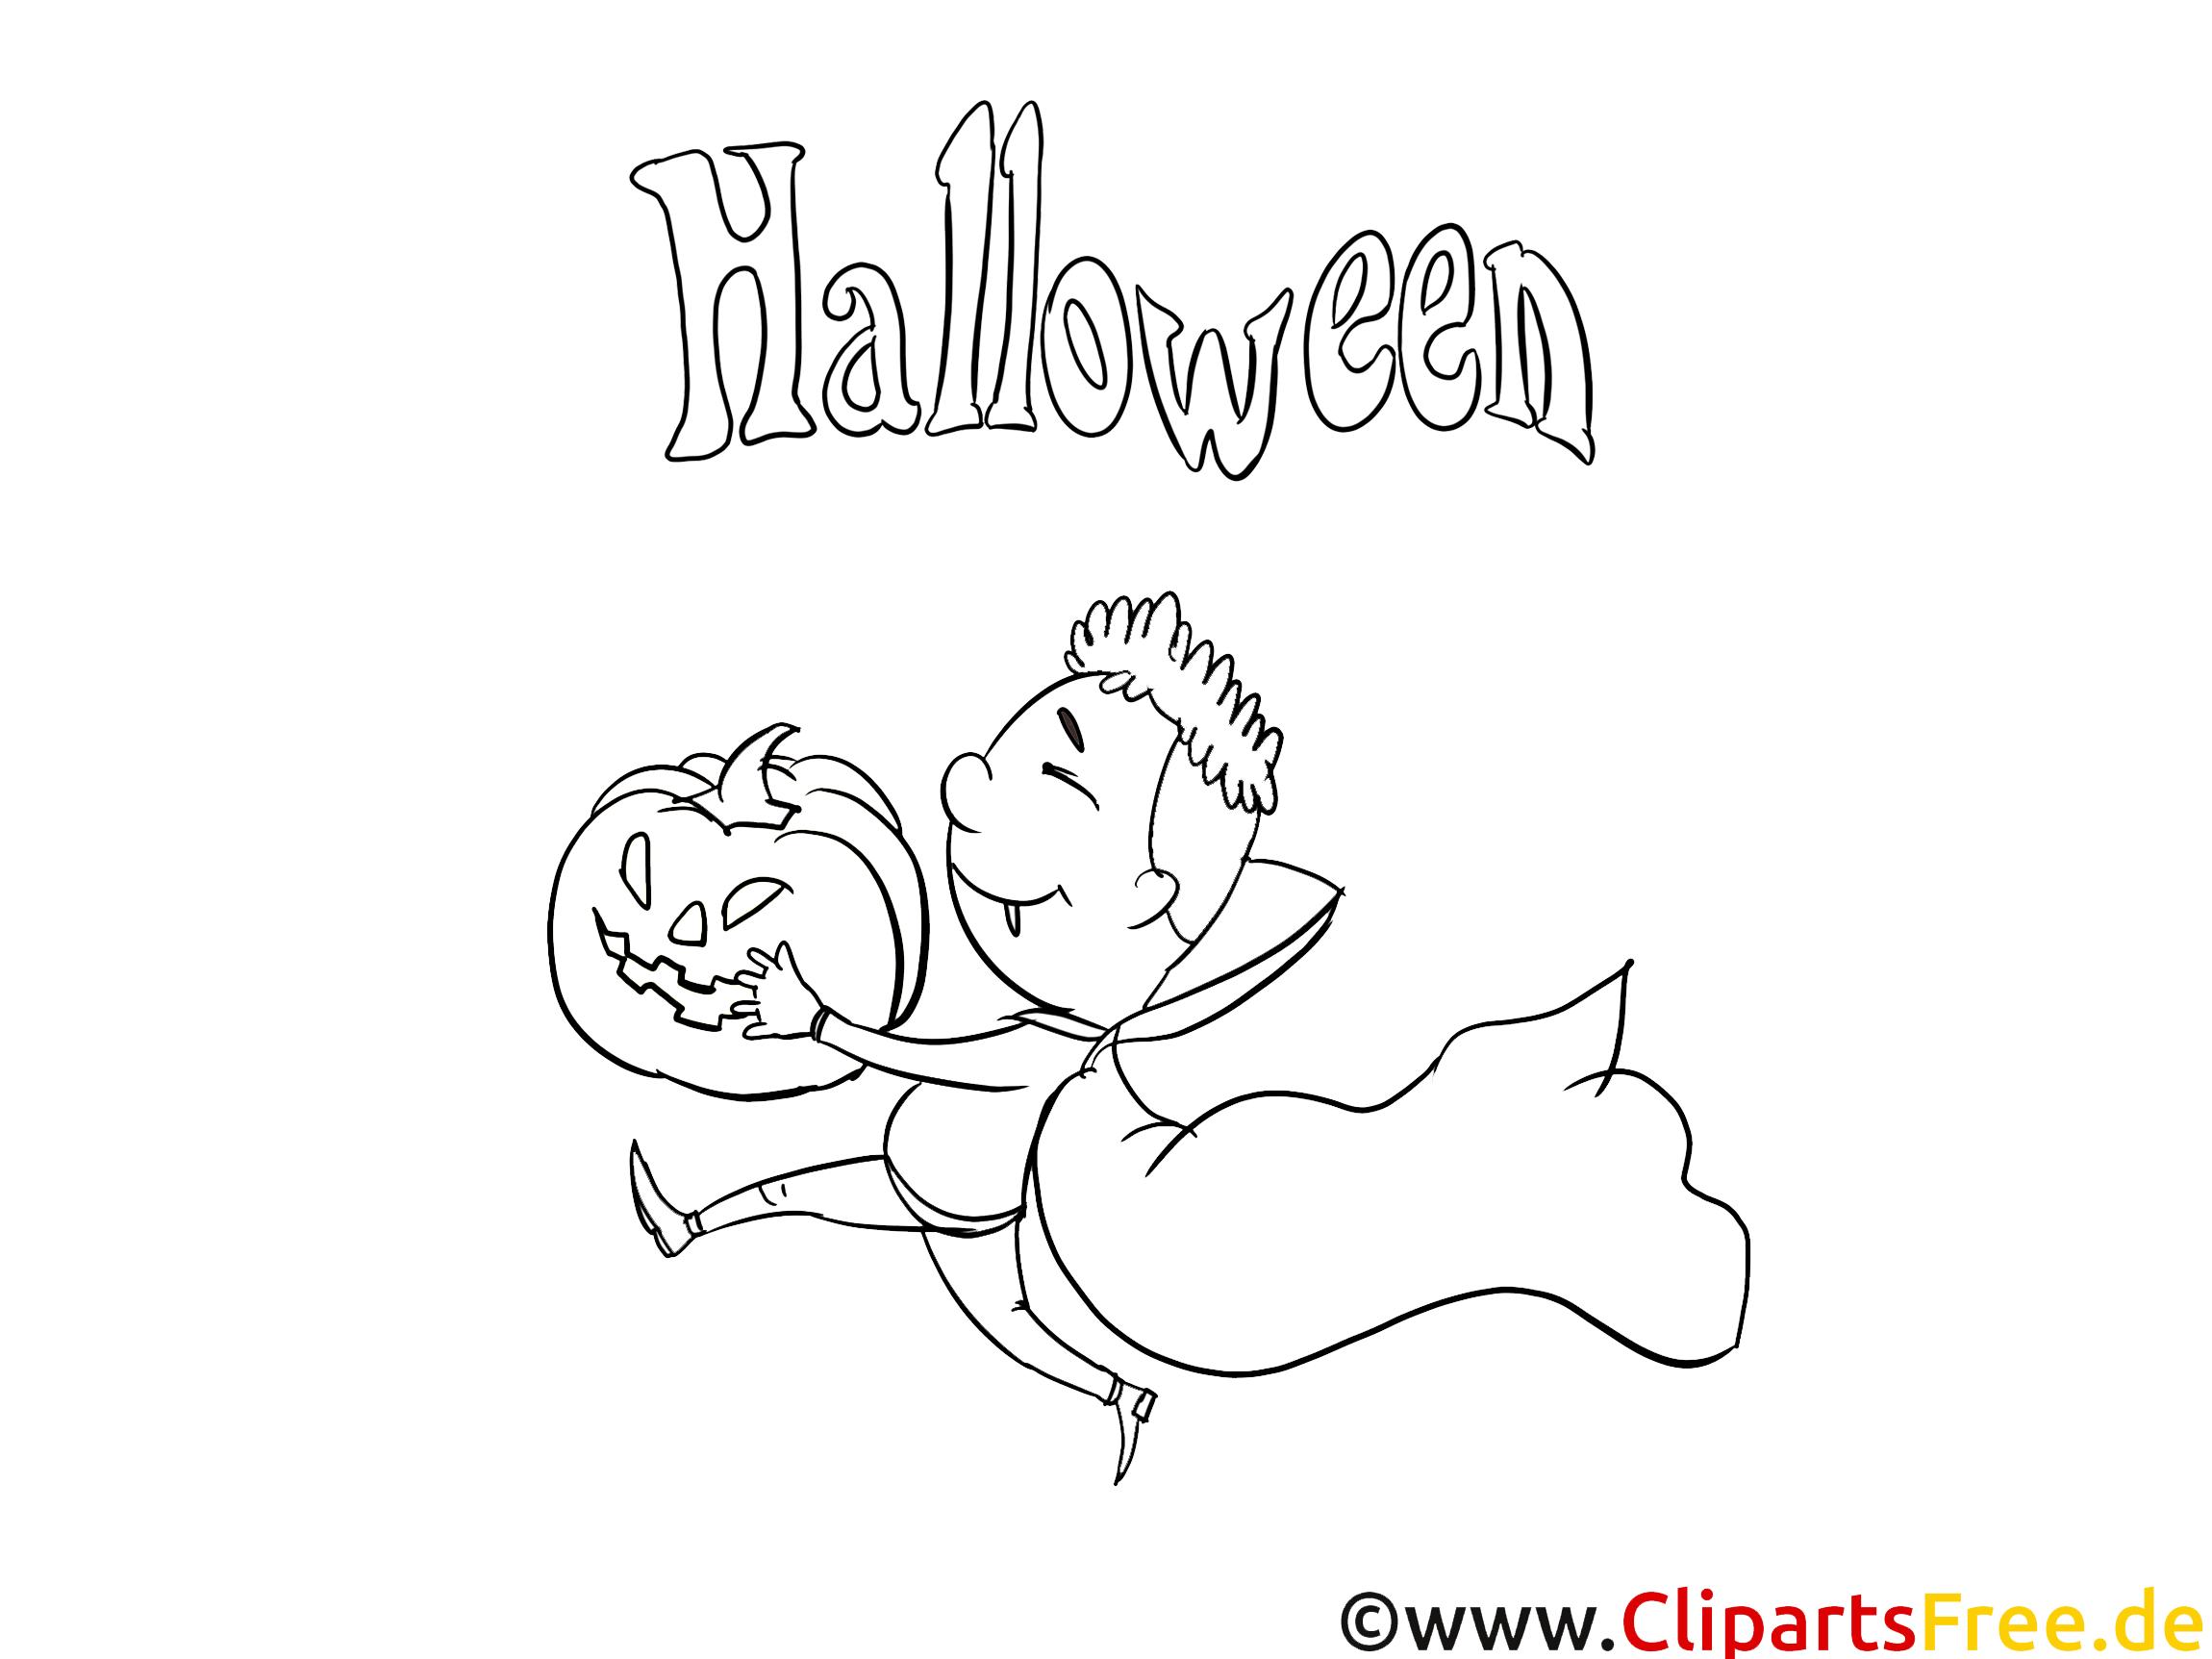 Halloween Grafik zum Malen